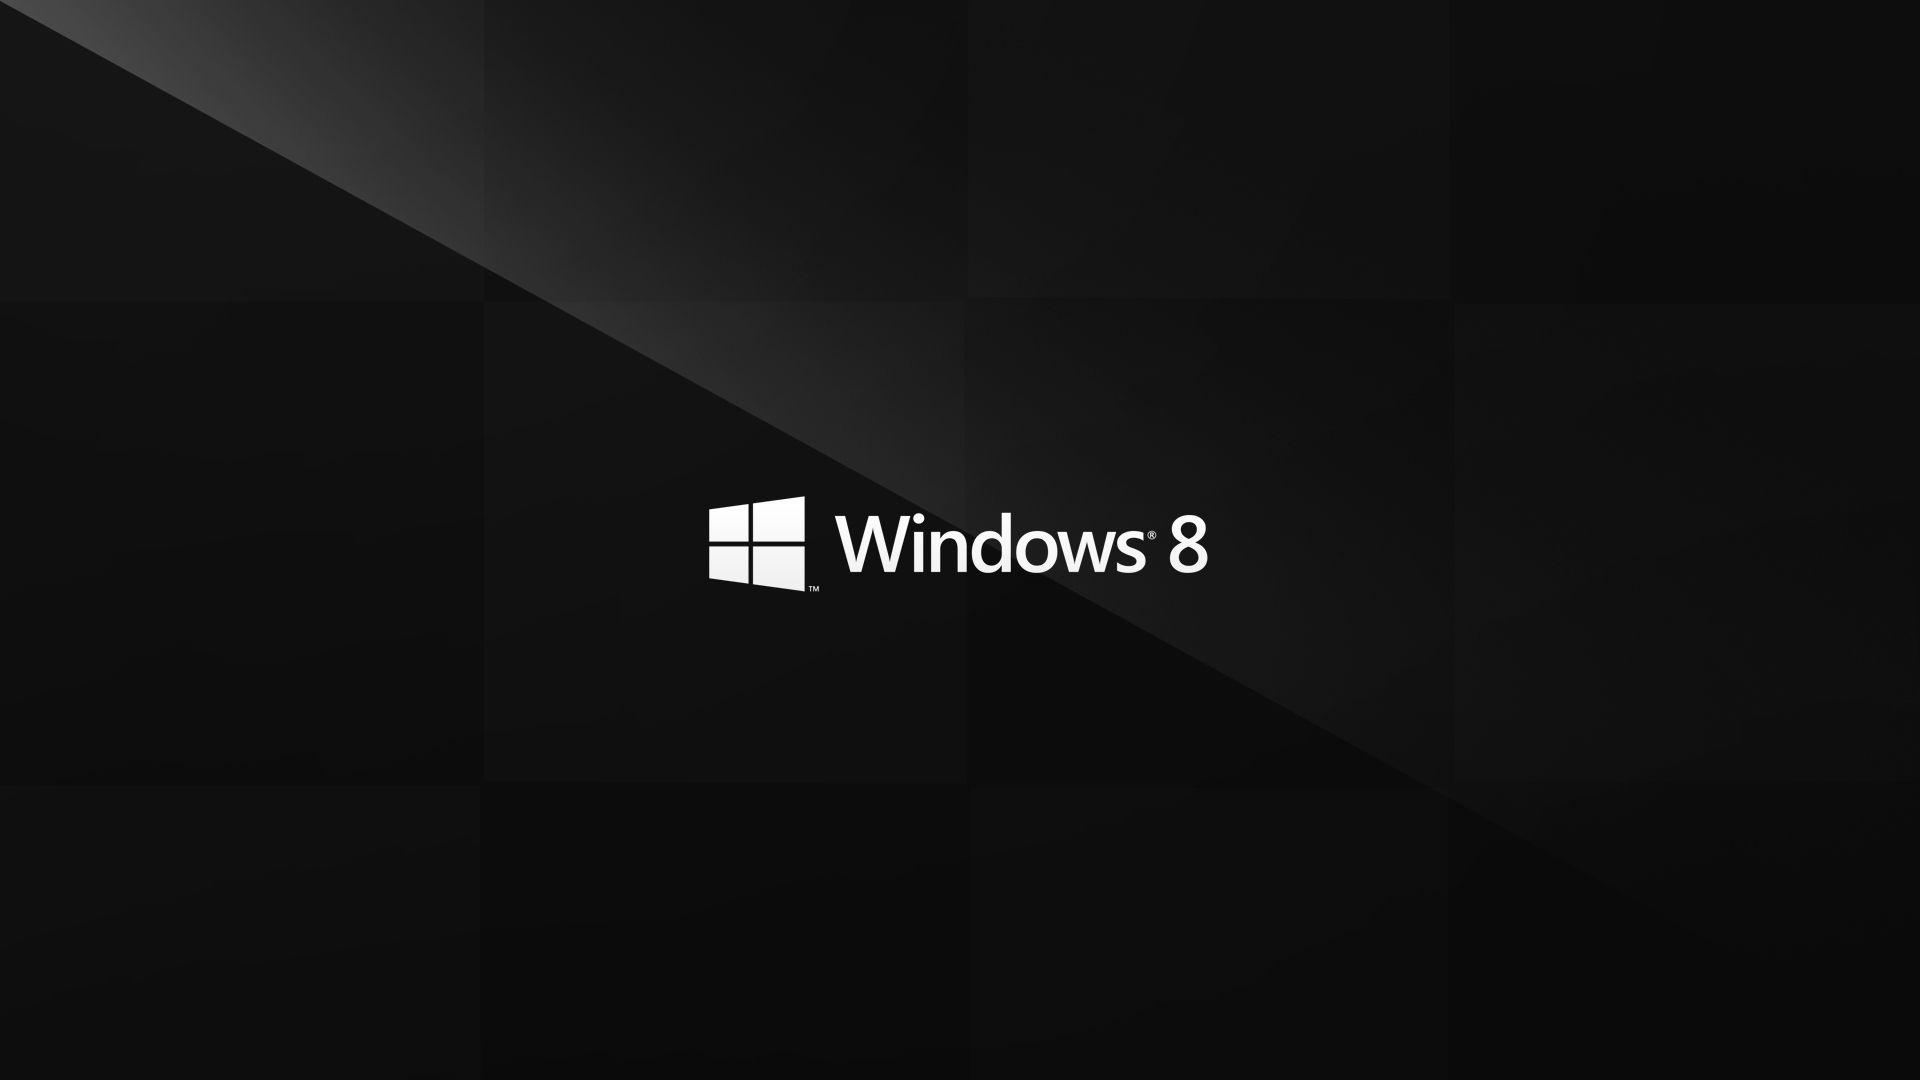 black windows 8 wallpapers a· background hd wallpaperwallpaper